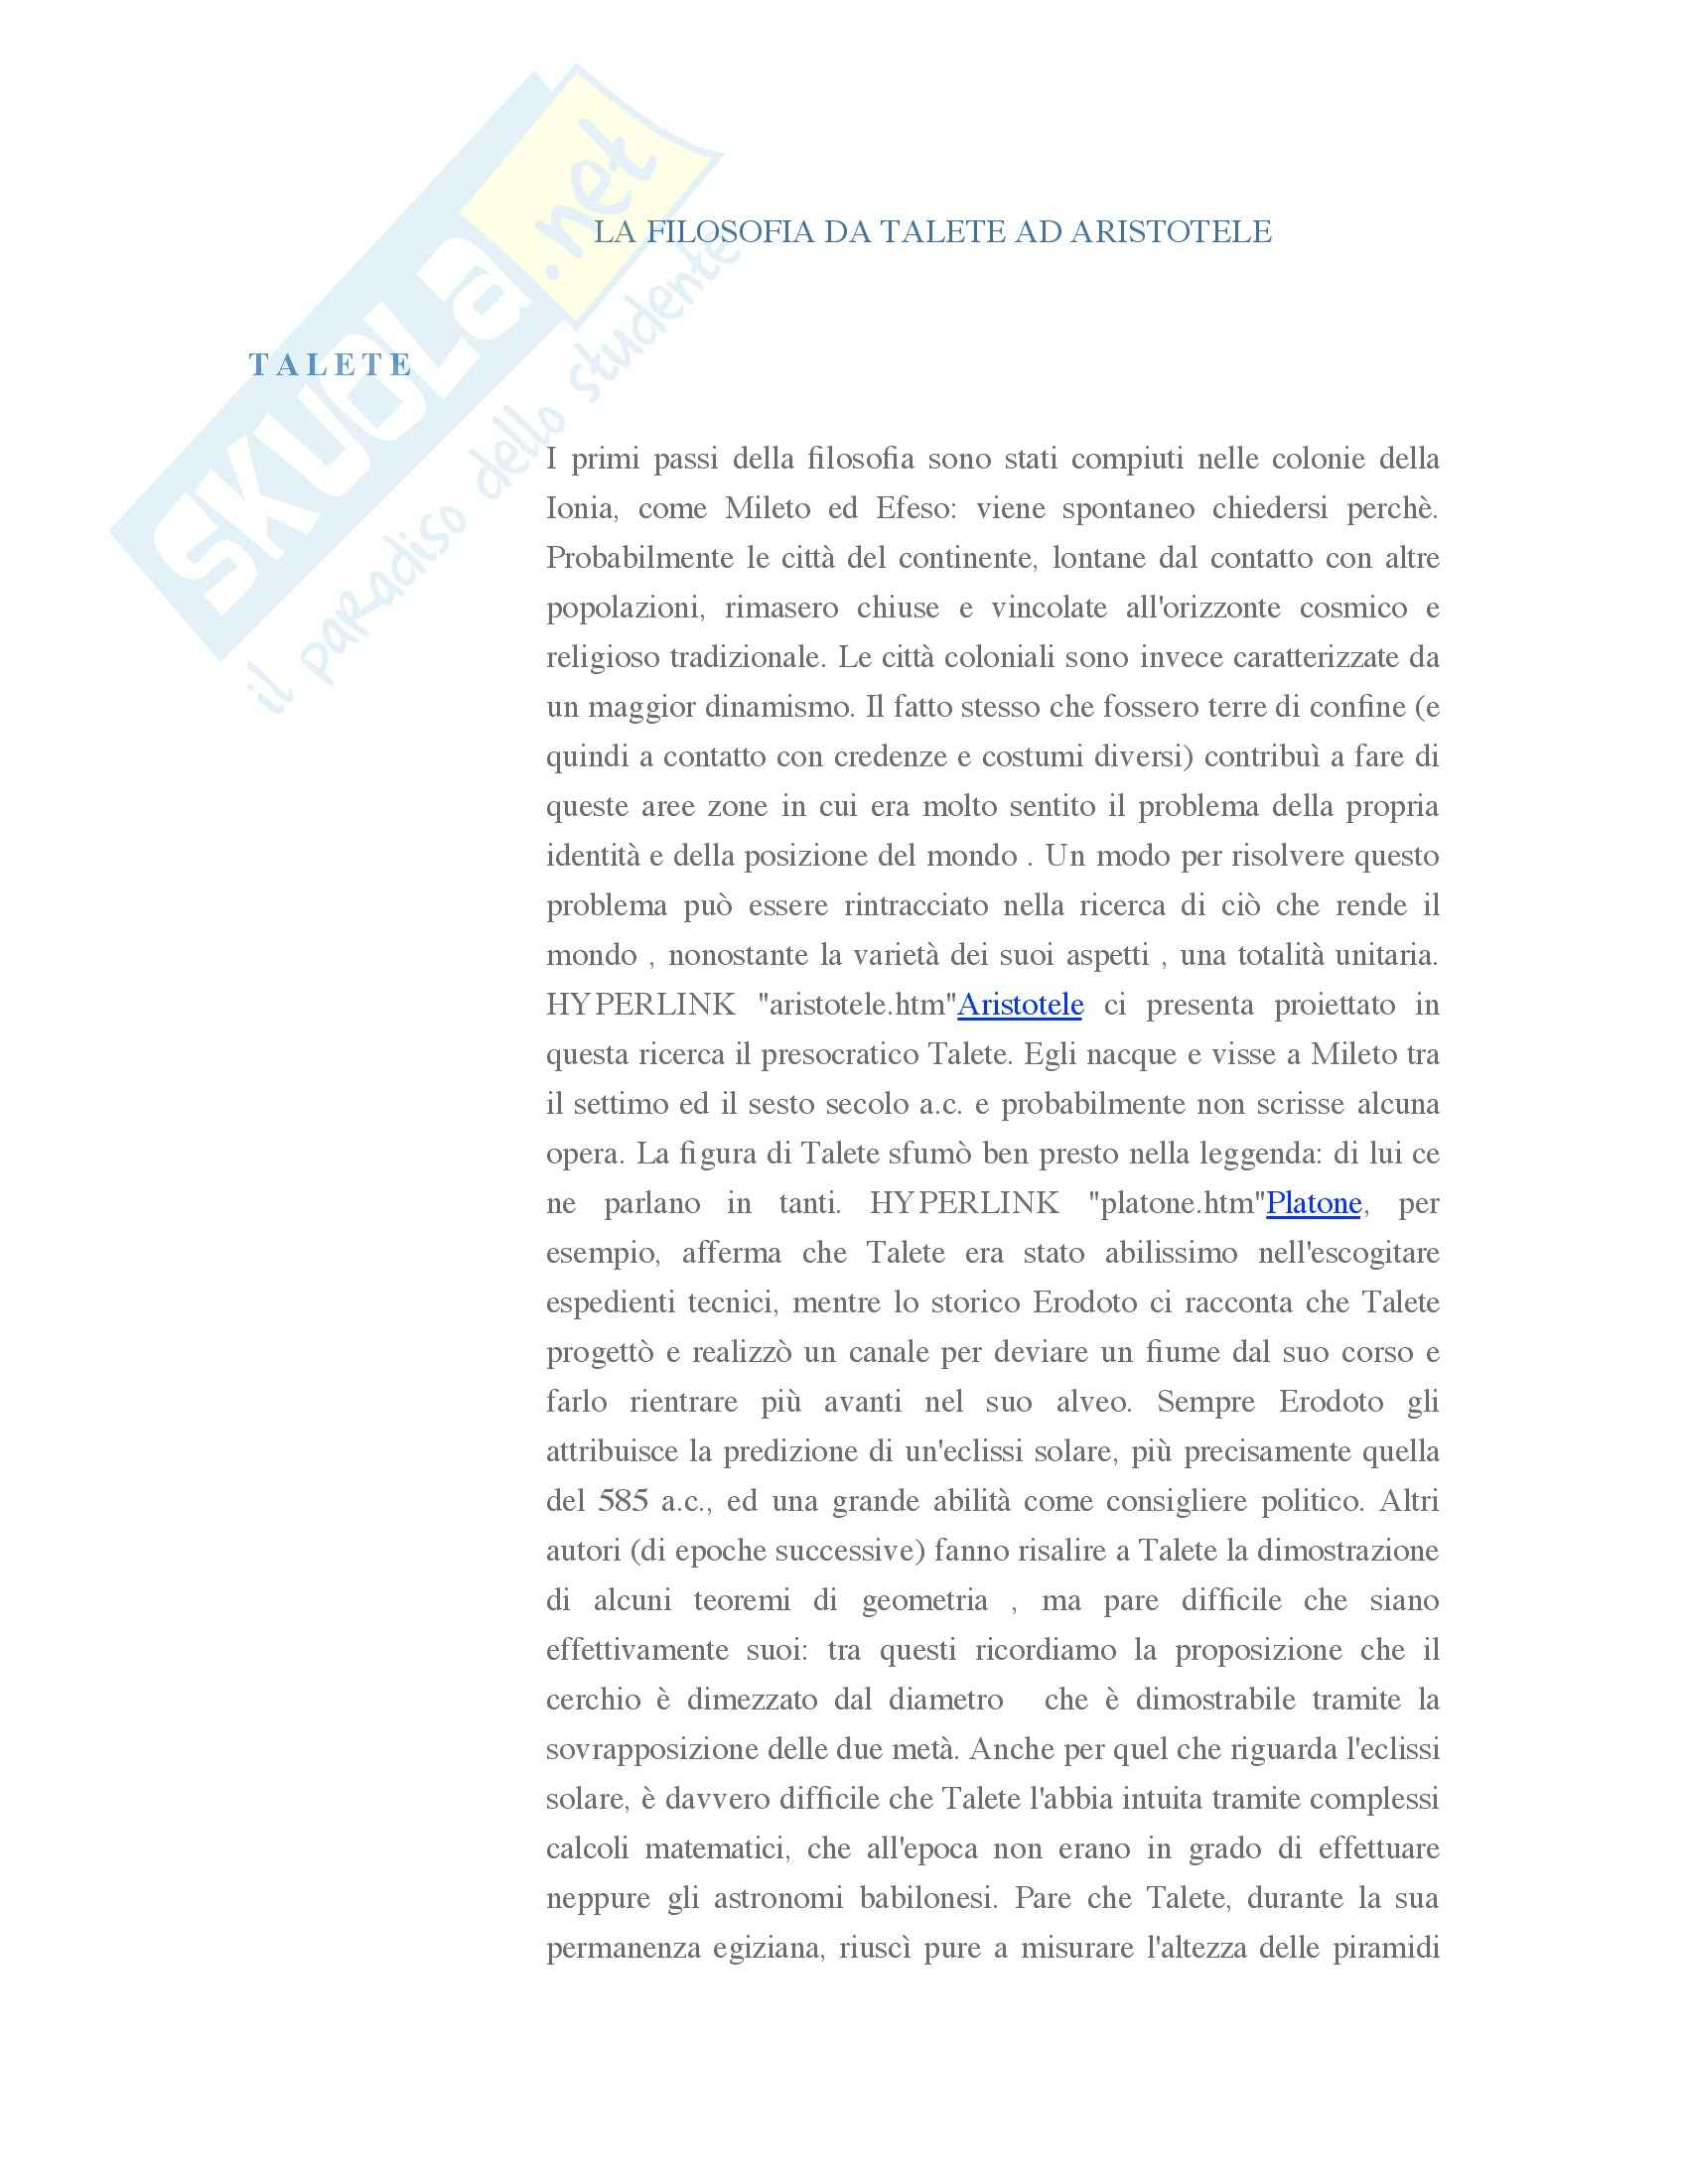 Filosofia antica - Appunti